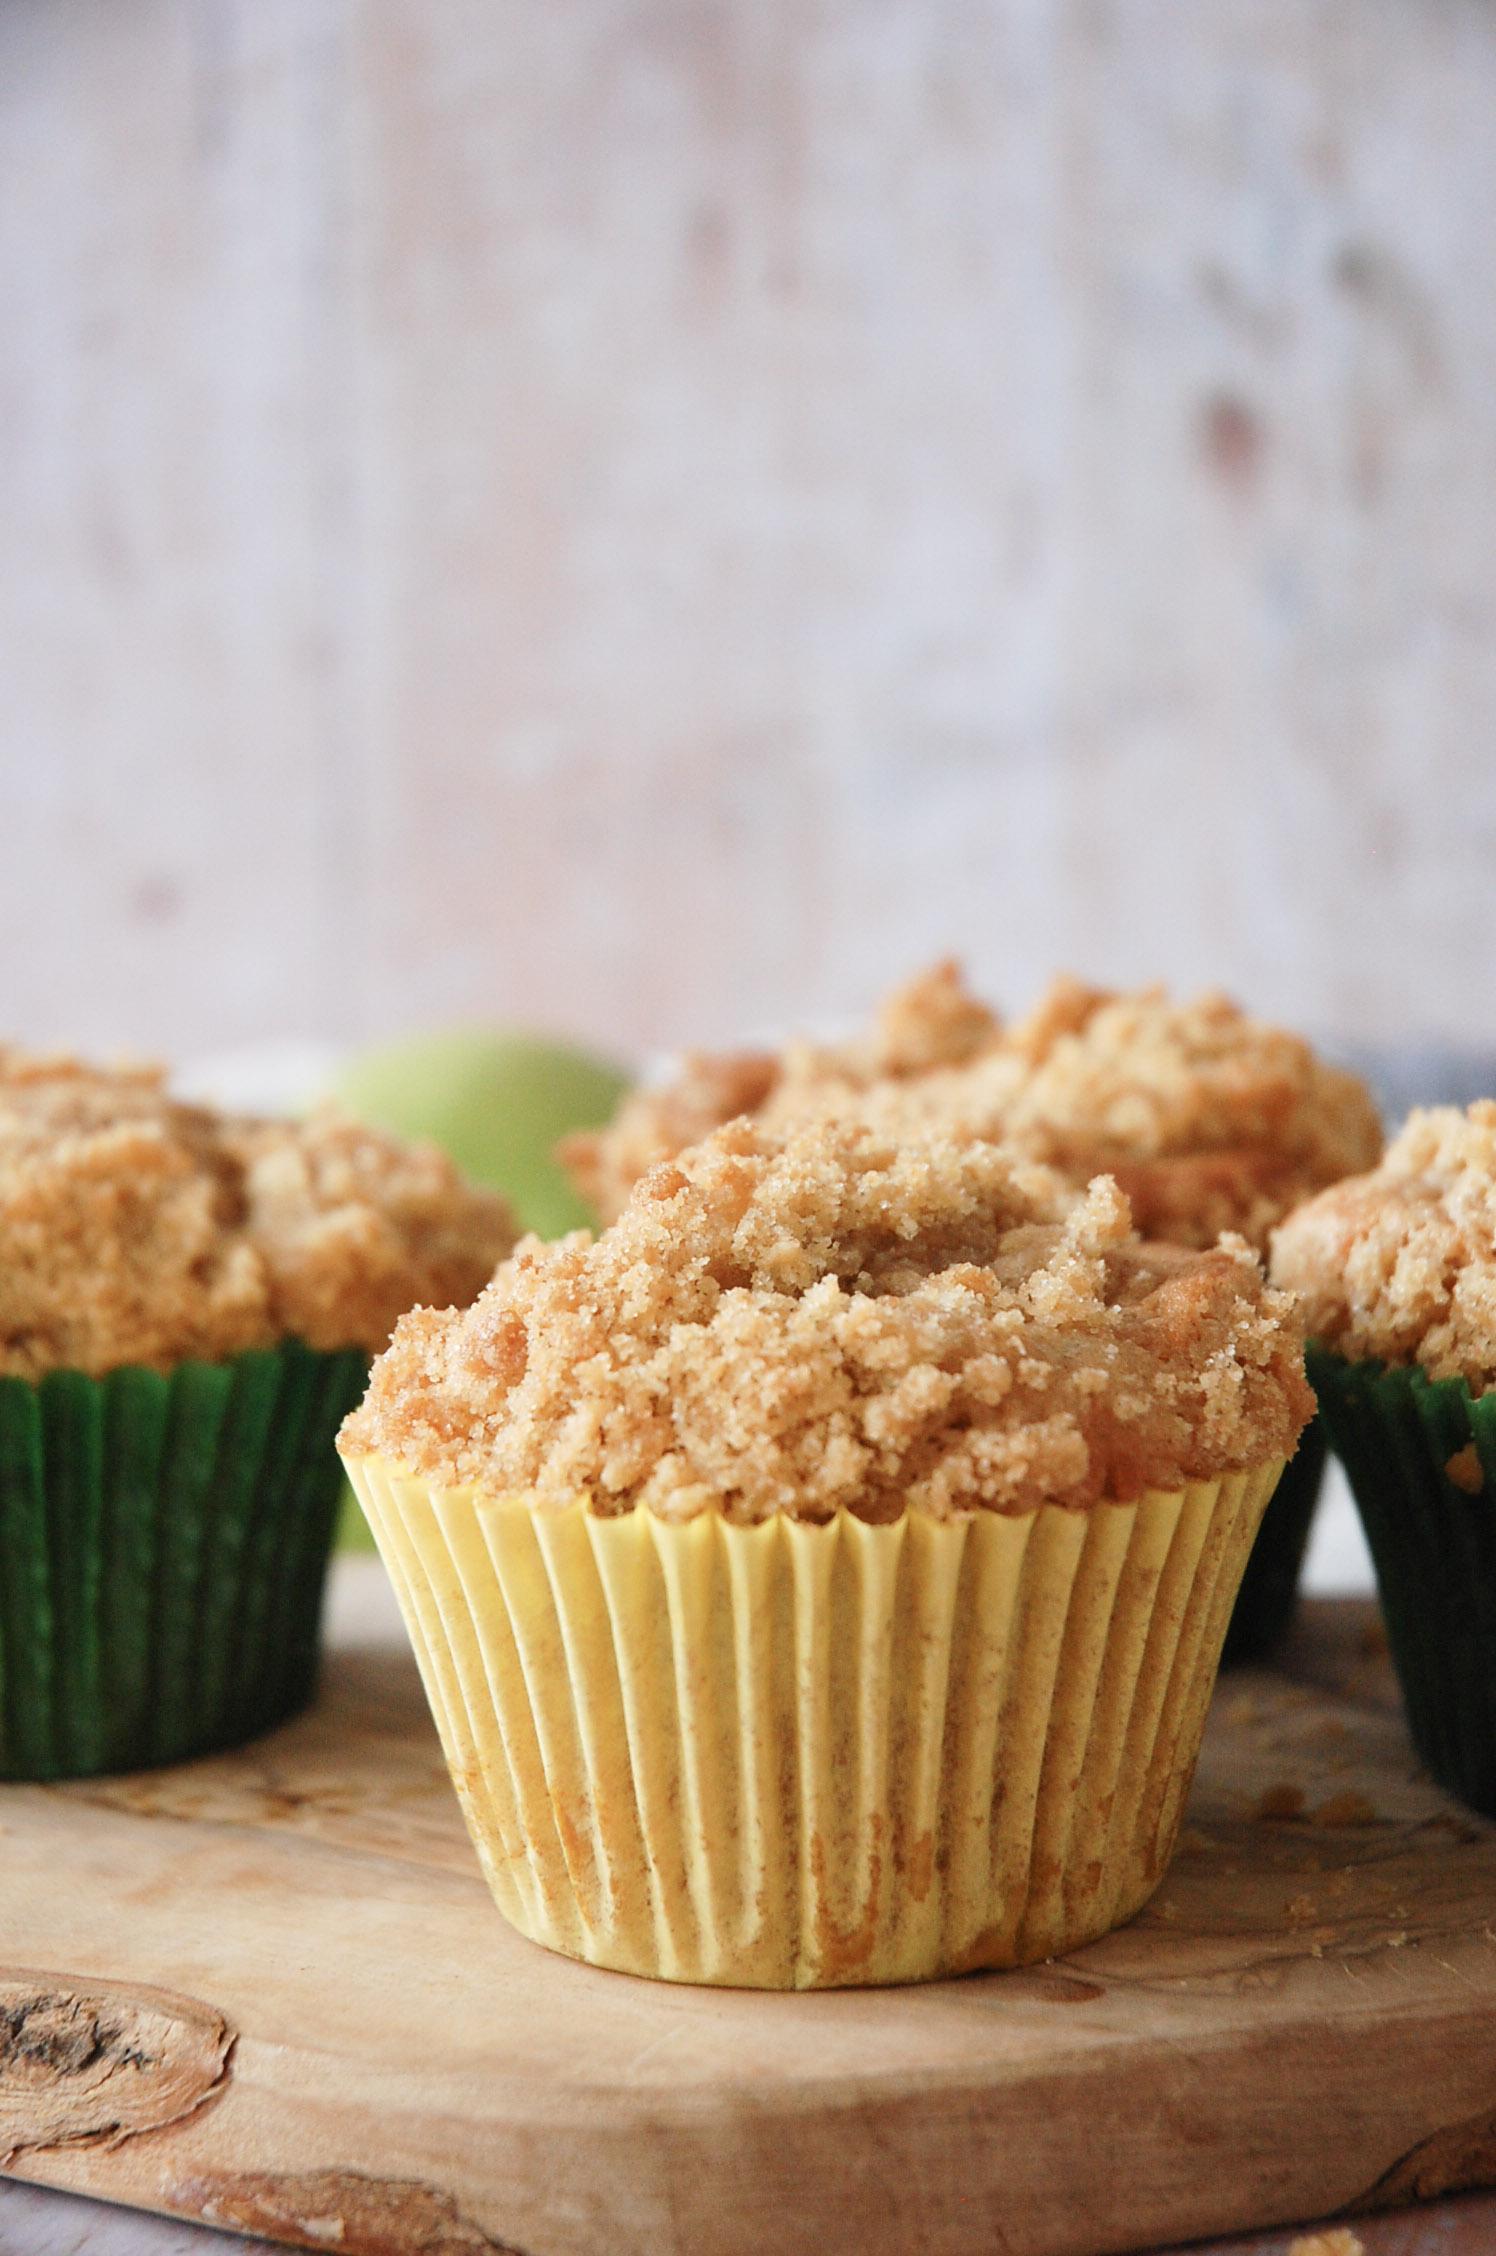 Apple Crumble Cupcakes